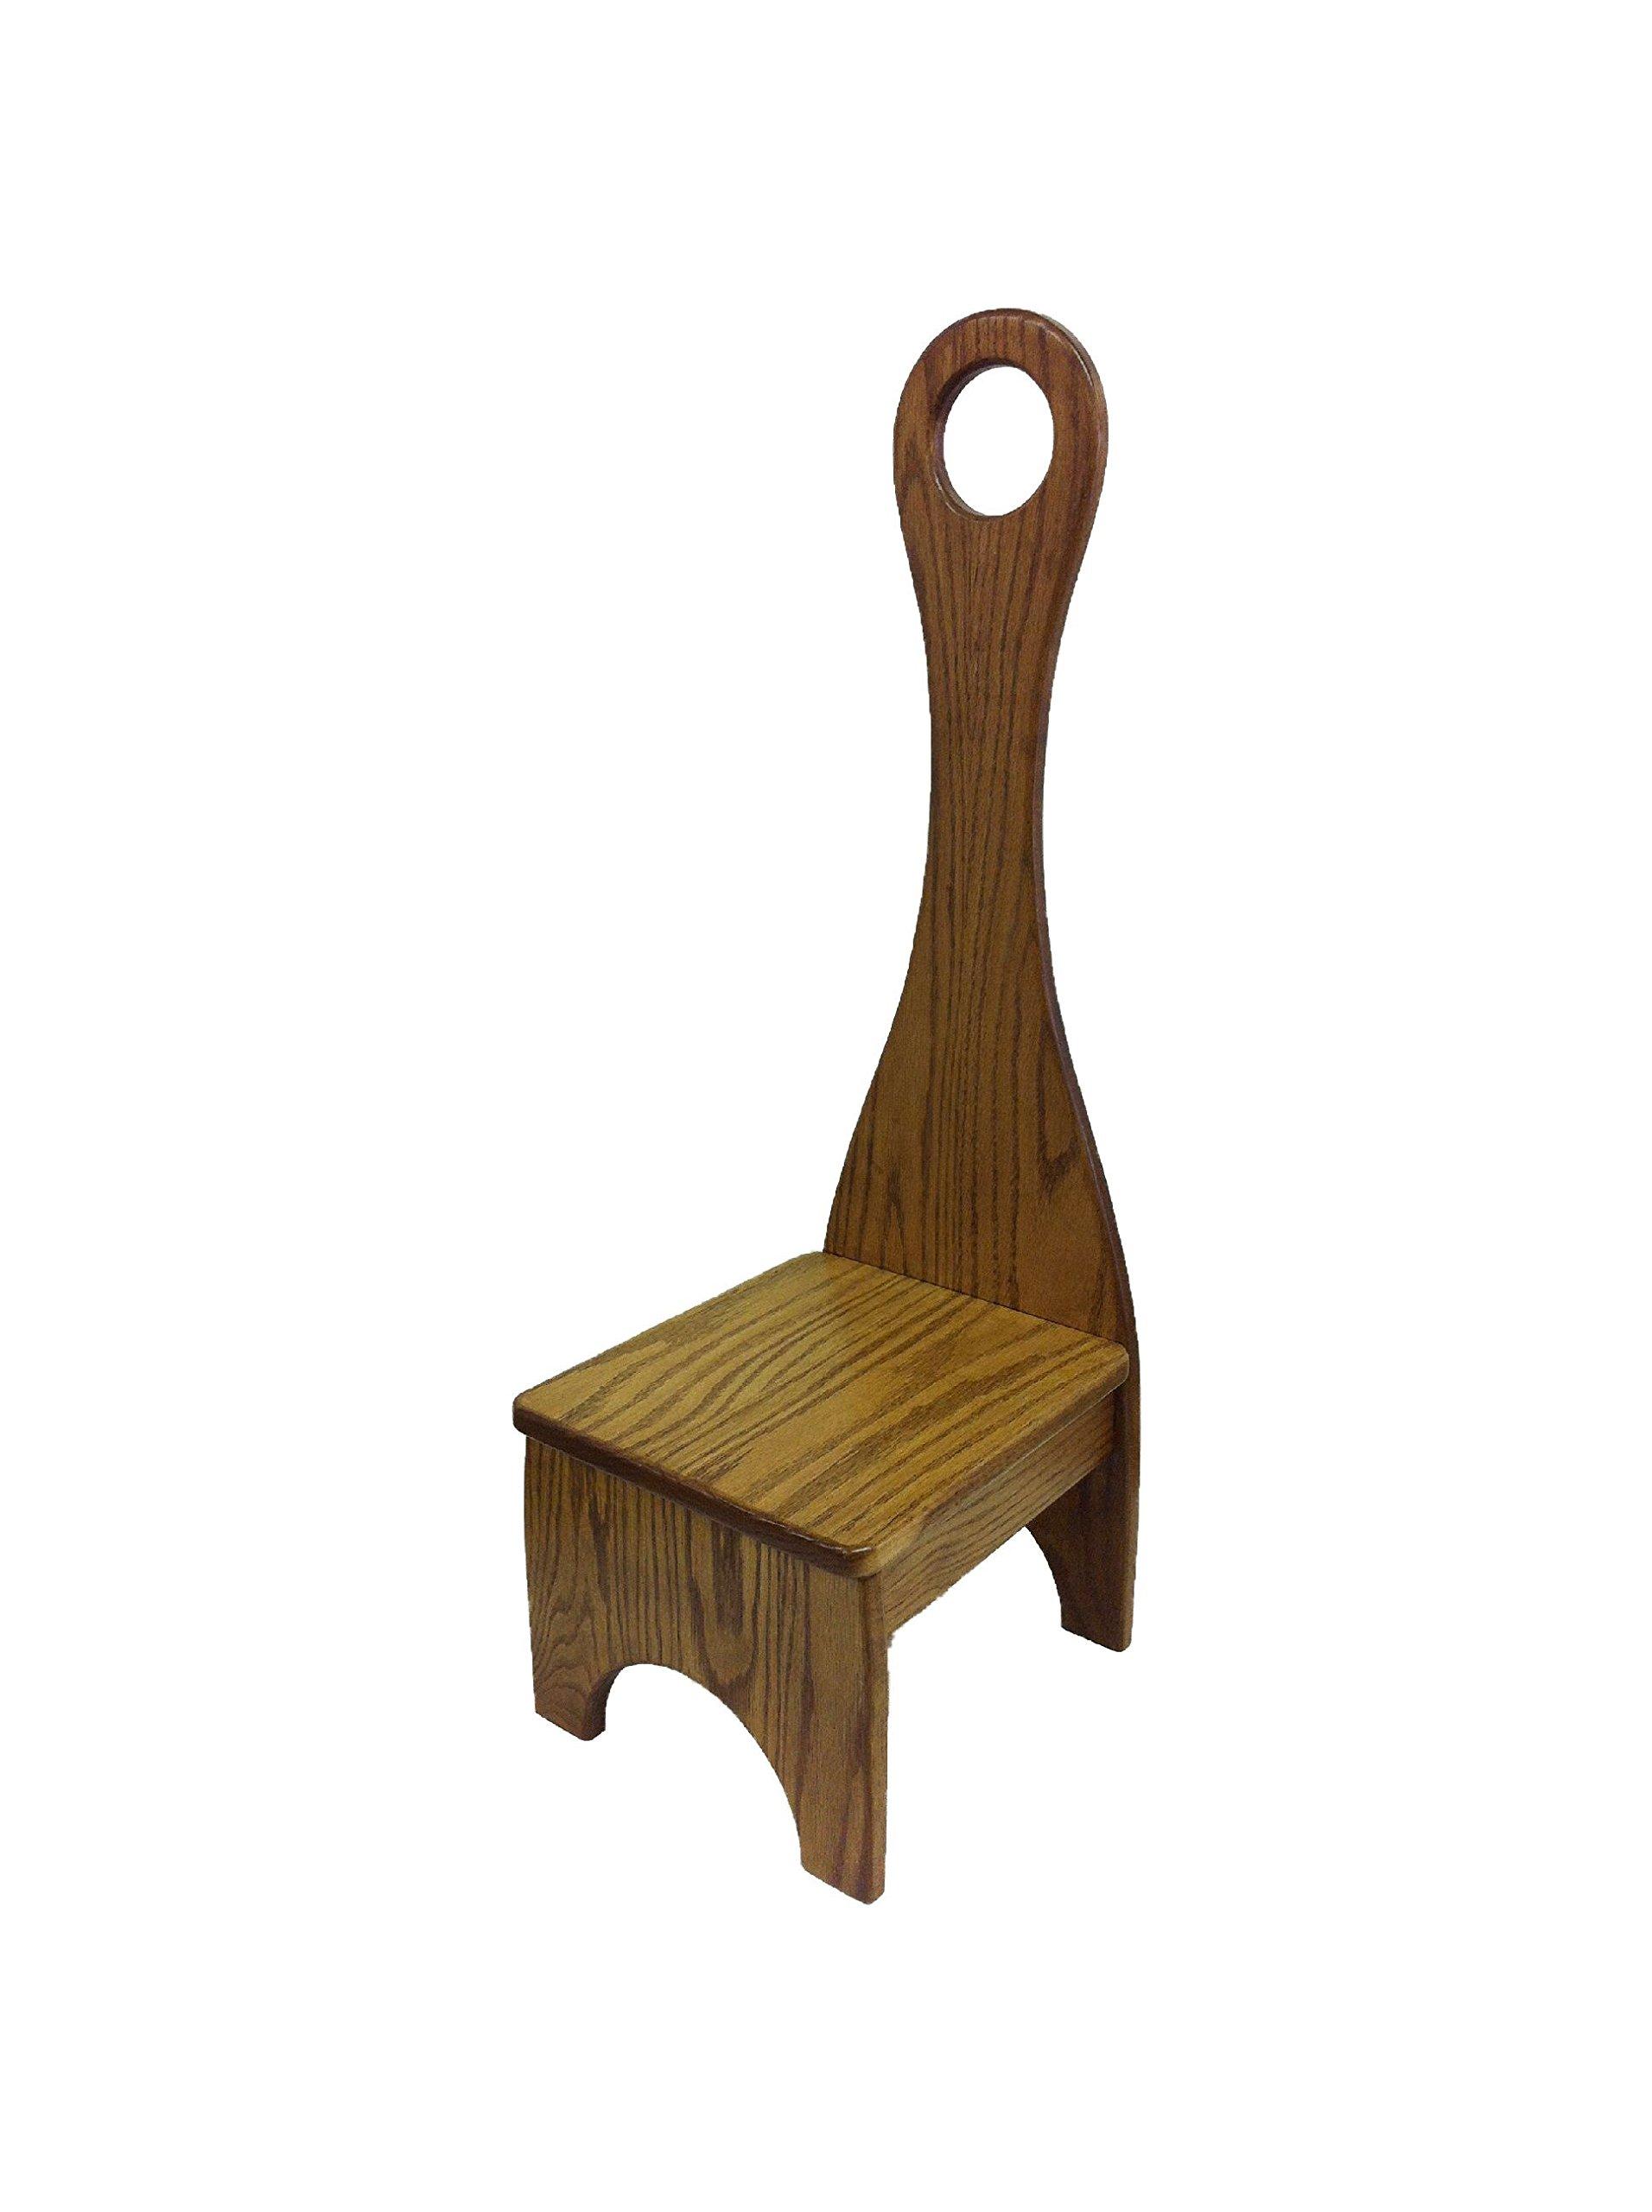 Tall Handle Step Stool, Solid Wood Bench Step Stool (Medium Stain, Oak)